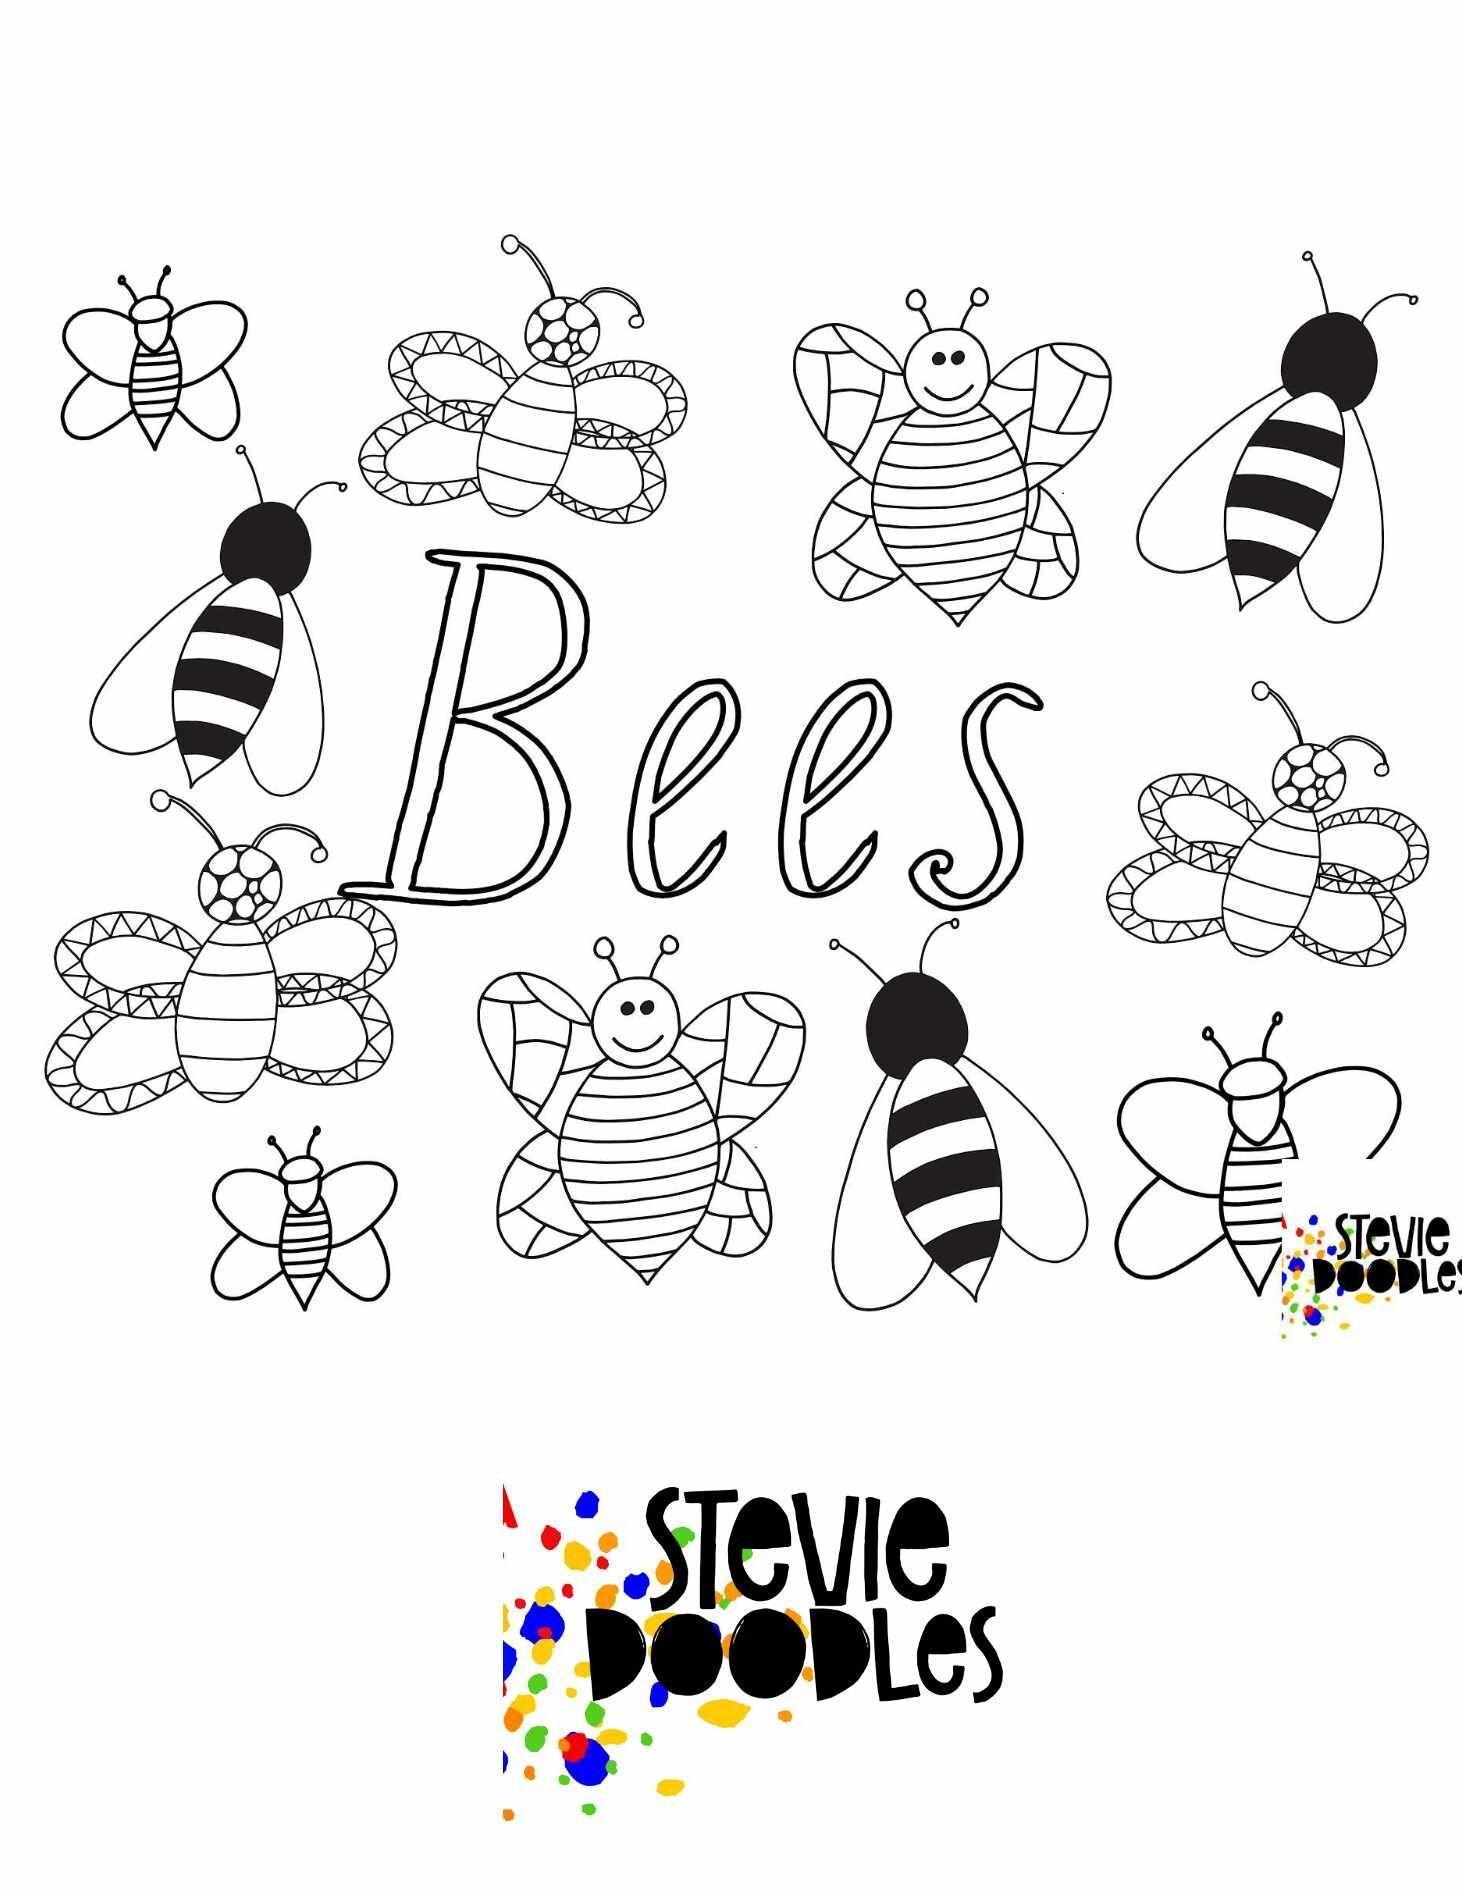 Bees Free Printable Coloring Page Stevie Doodles Bee Coloring Pages Free Printable Coloring Pages Free Printable Coloring